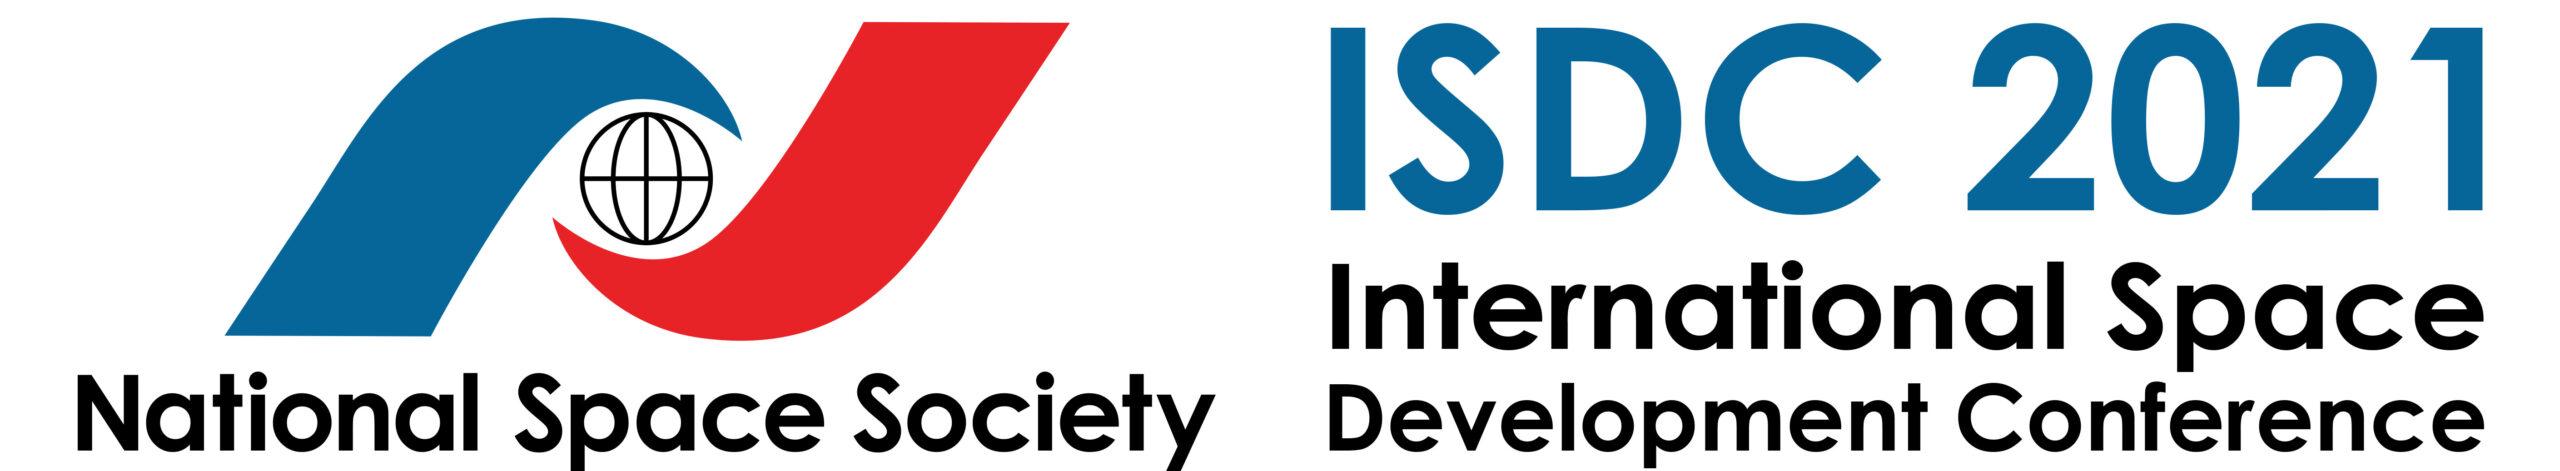 International Space Development Conference 2021